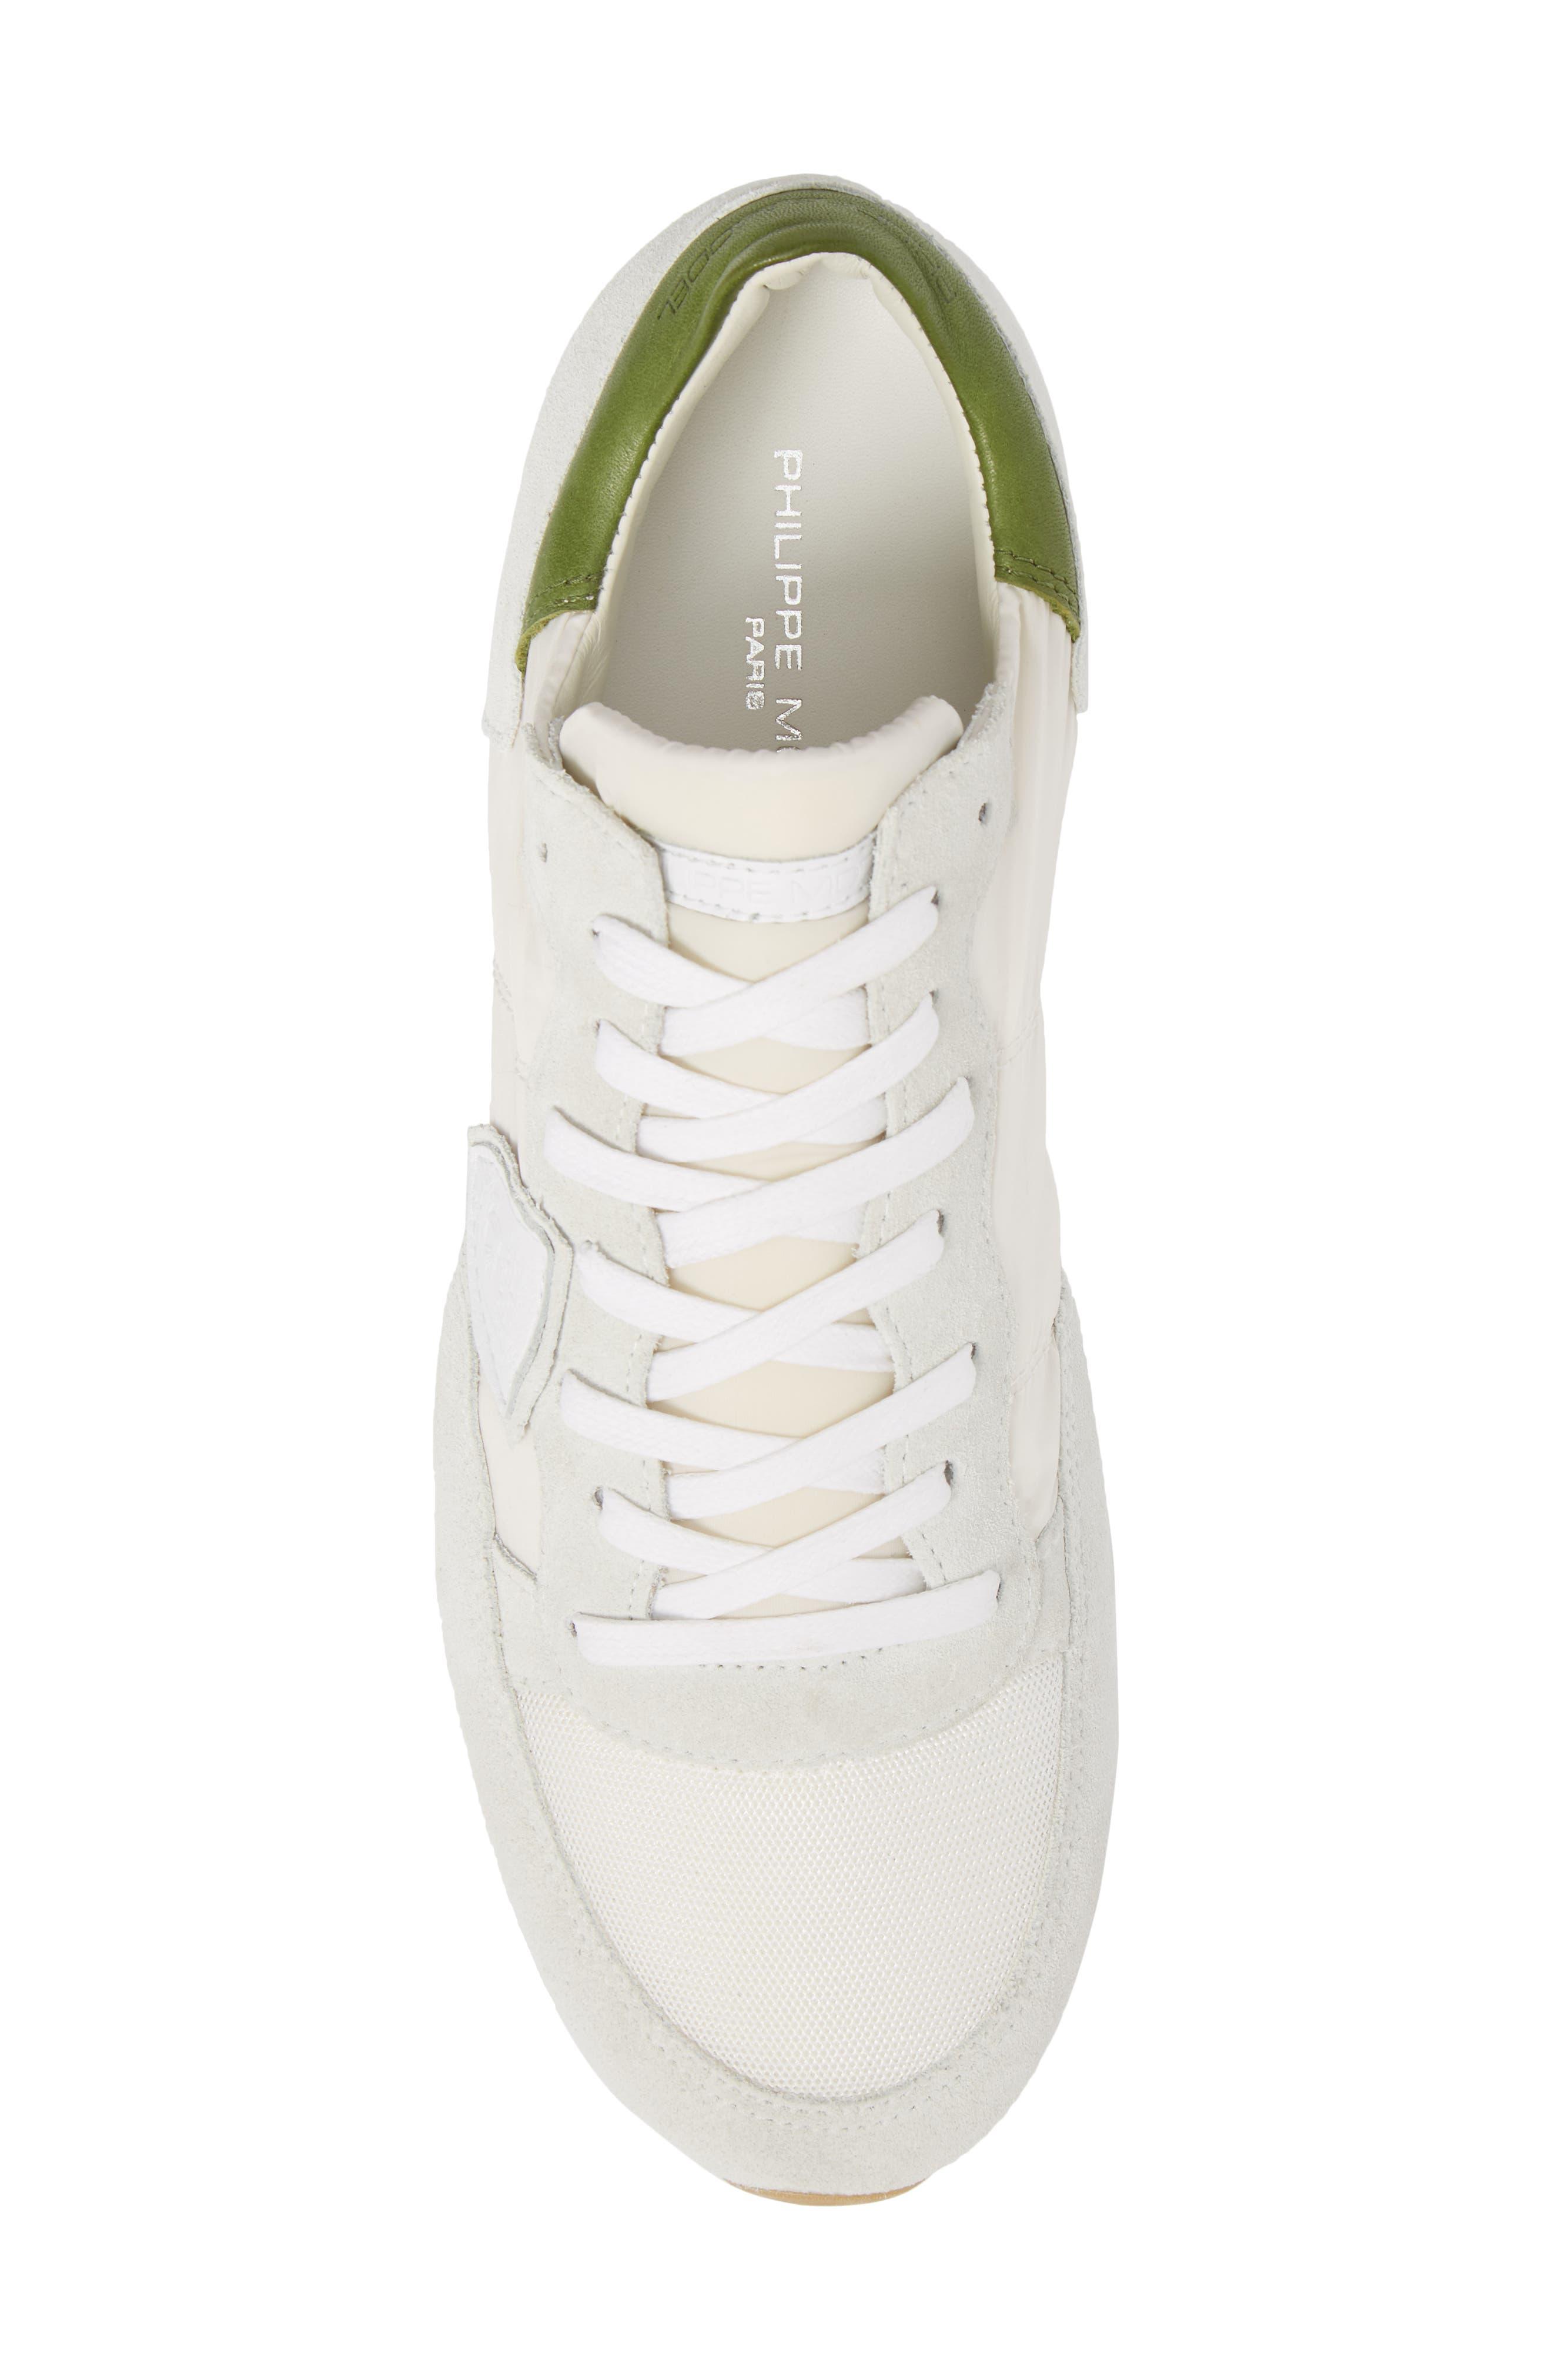 Tropez Sneaker,                             Alternate thumbnail 5, color,                             White/ Green